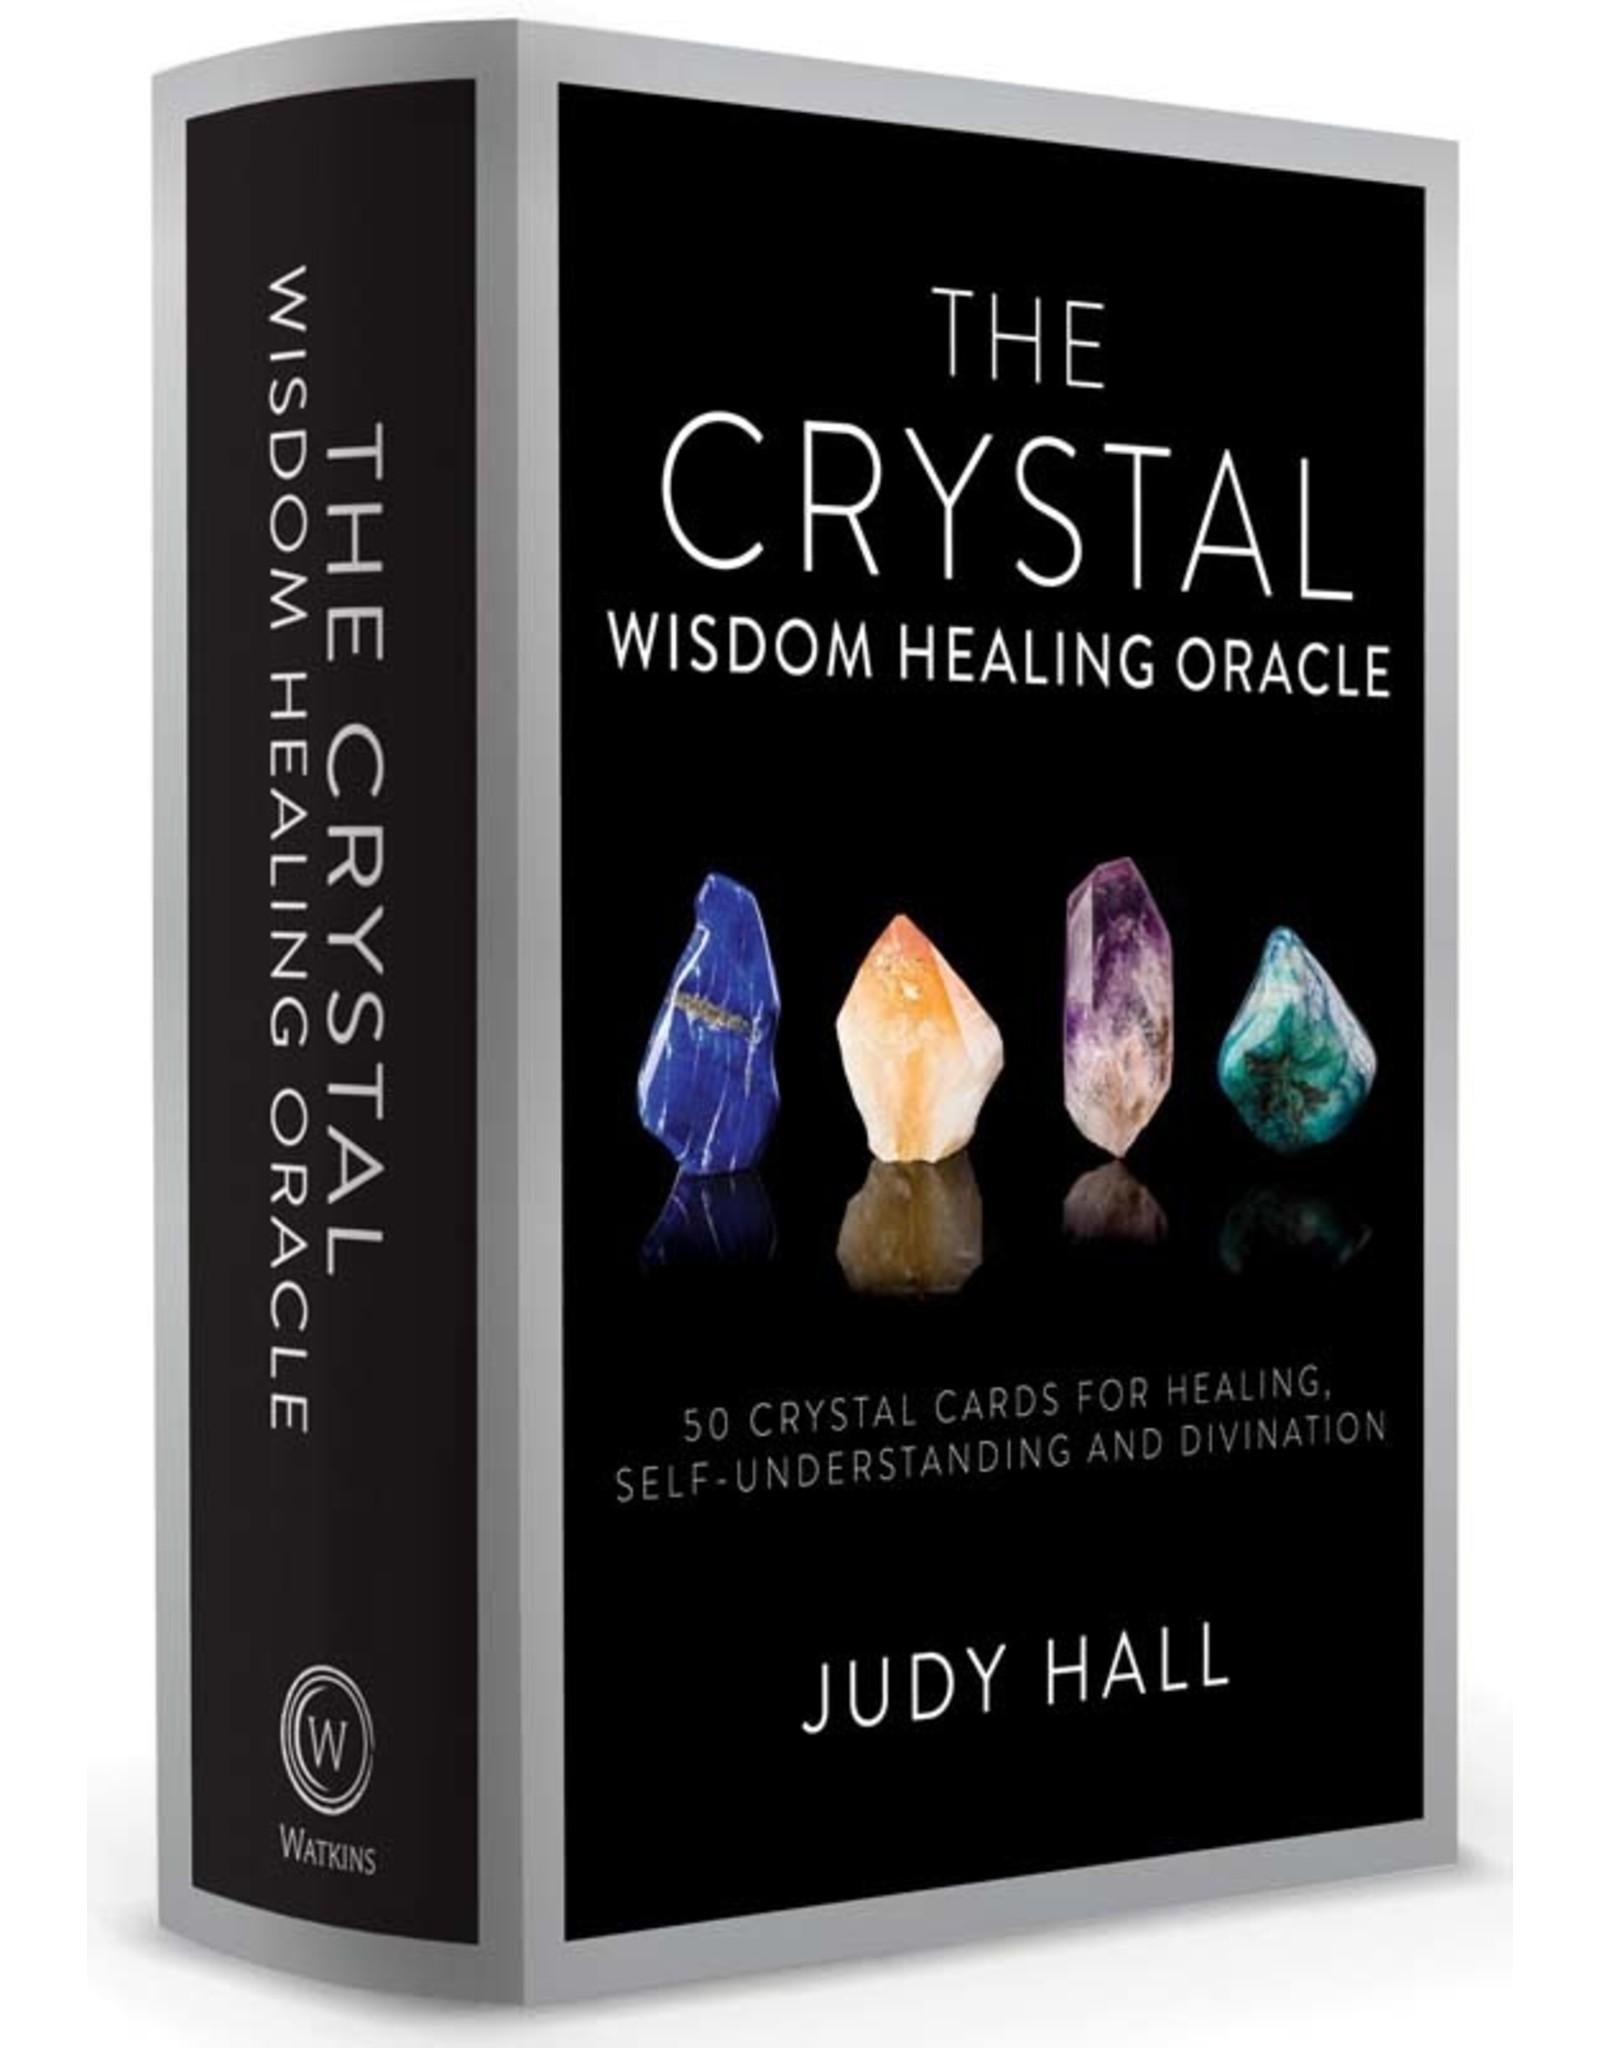 Crystal Wisdom Healing Oracle Cards